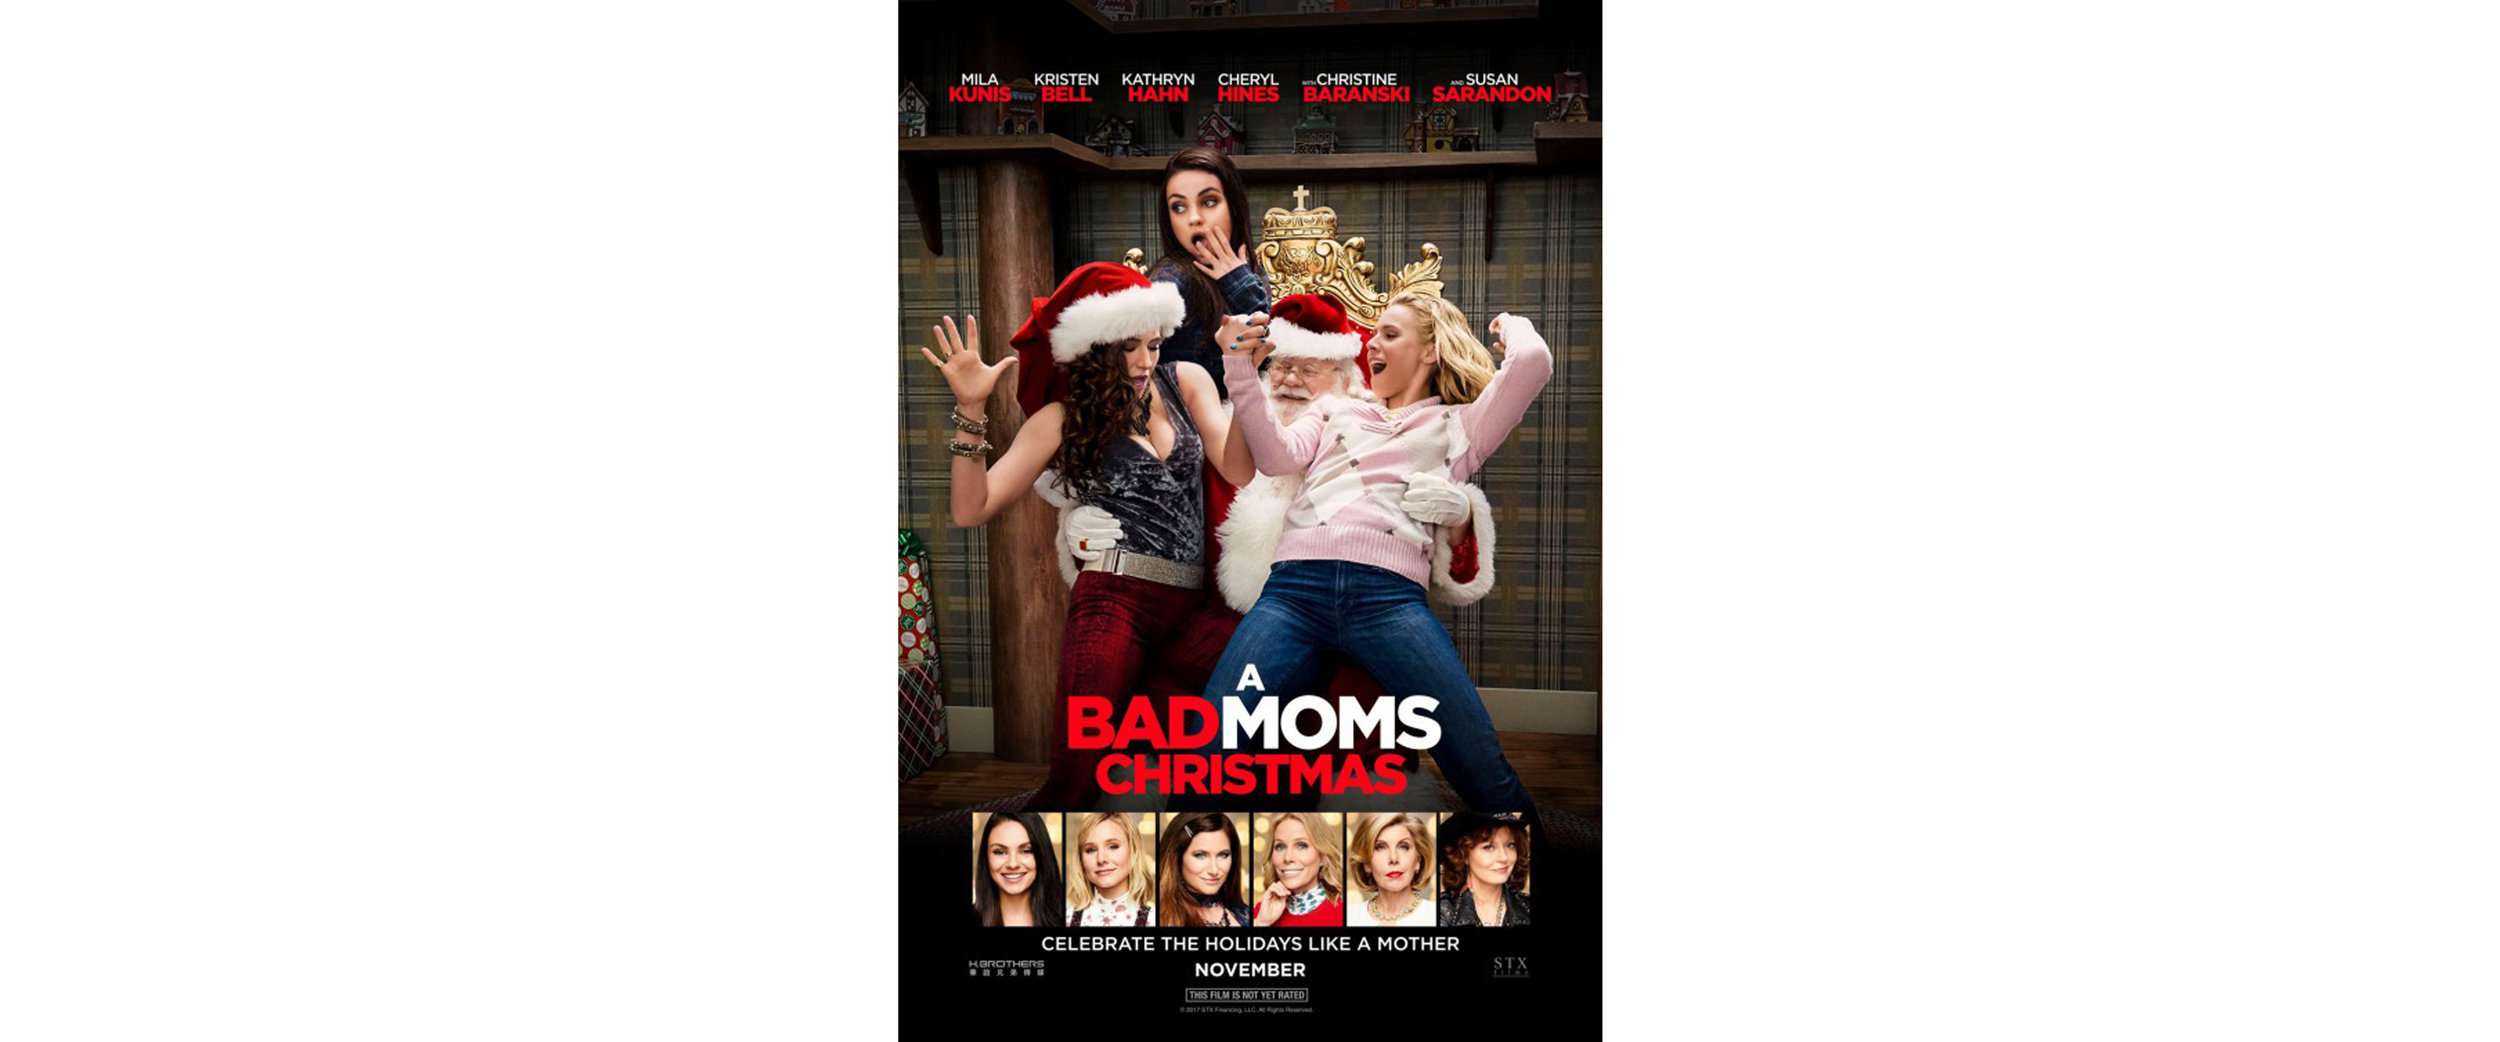 Bad Moms Christmas_6.jpg